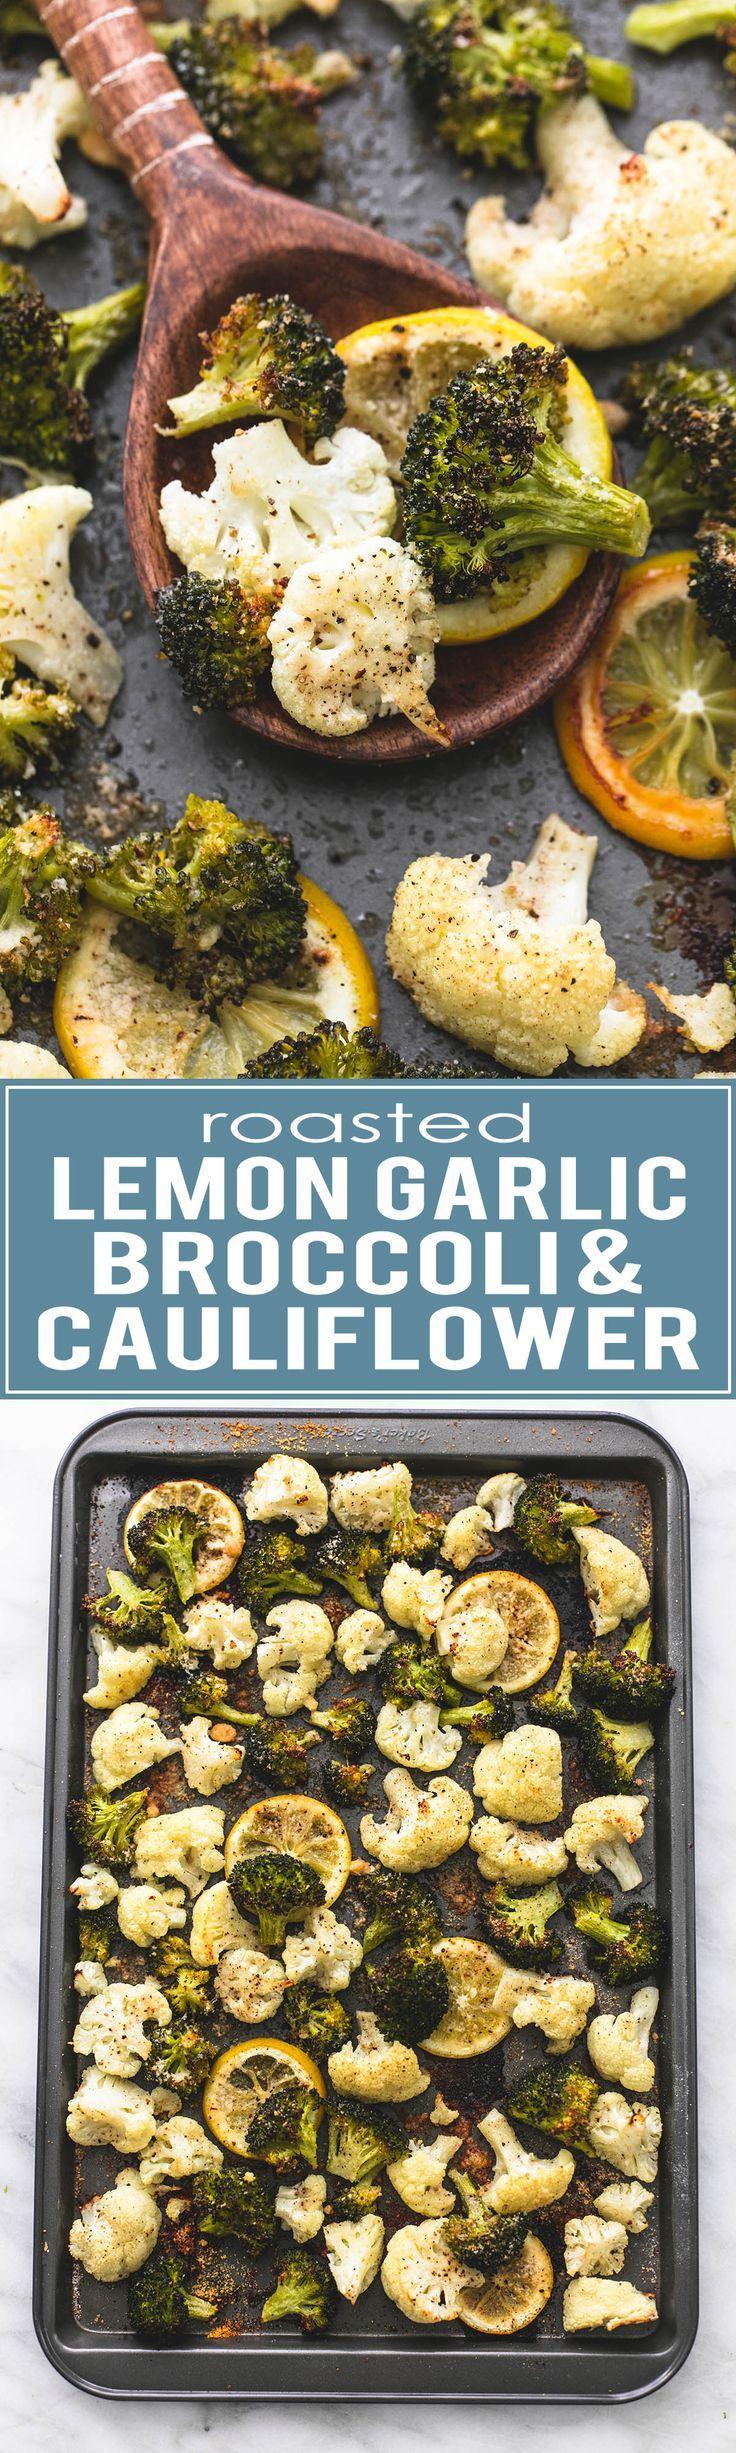 Easy and healthy One Pan Roasted Lemon Garlic Broccoli & Cauliflower   http://lecremedelacrumb.com